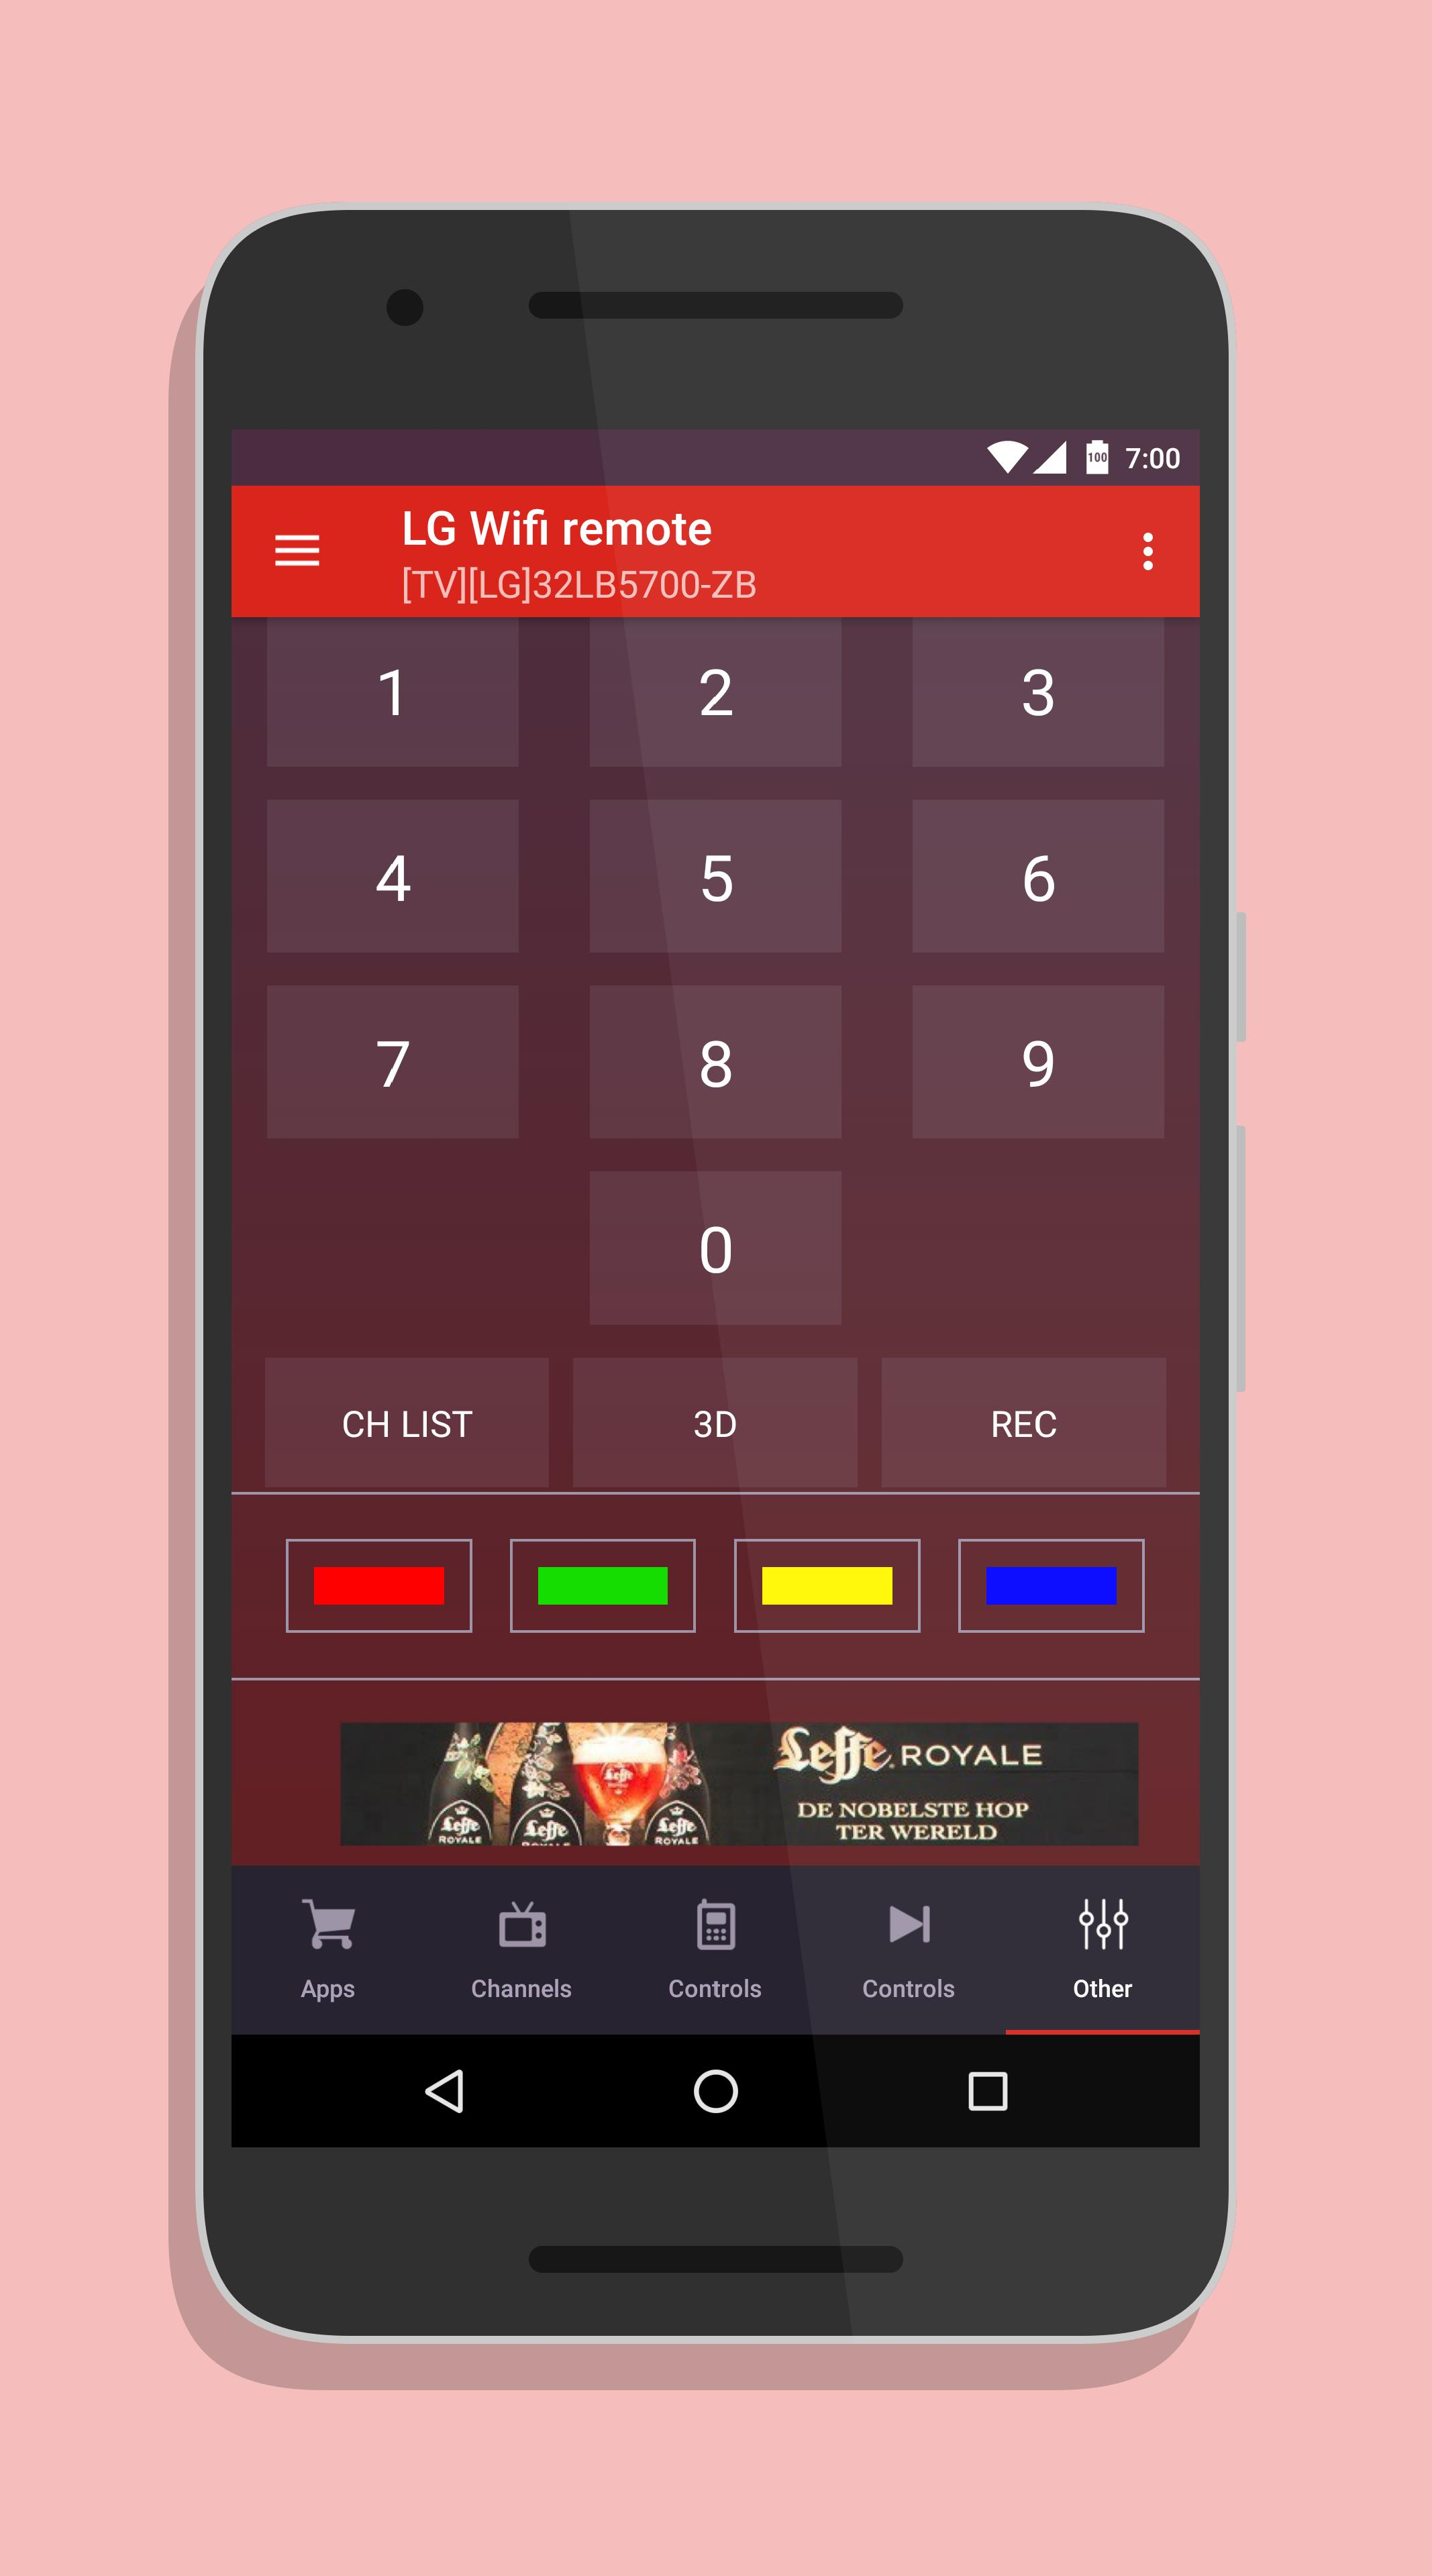 Smart TV Remote for LG SmartTV for Android - APK Download